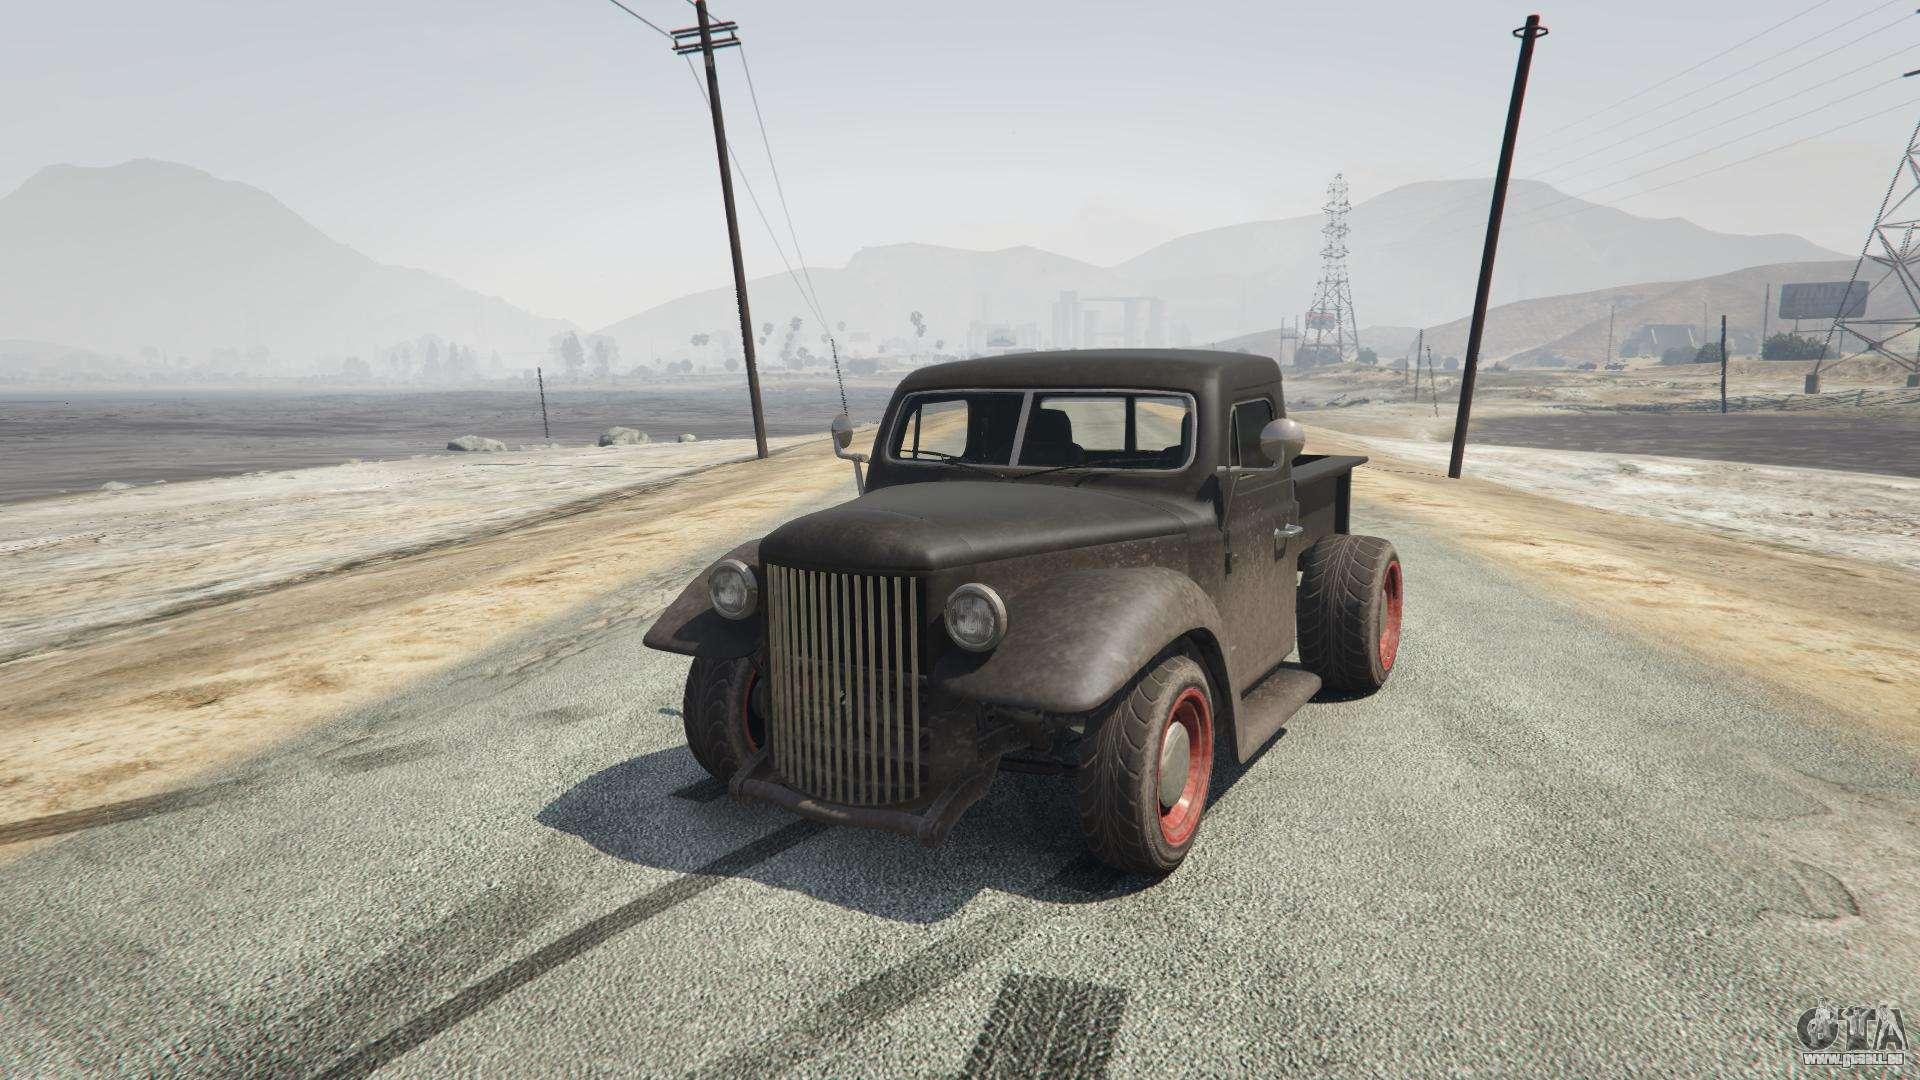 Rat-Truck aus GTA 5 - Frontansicht